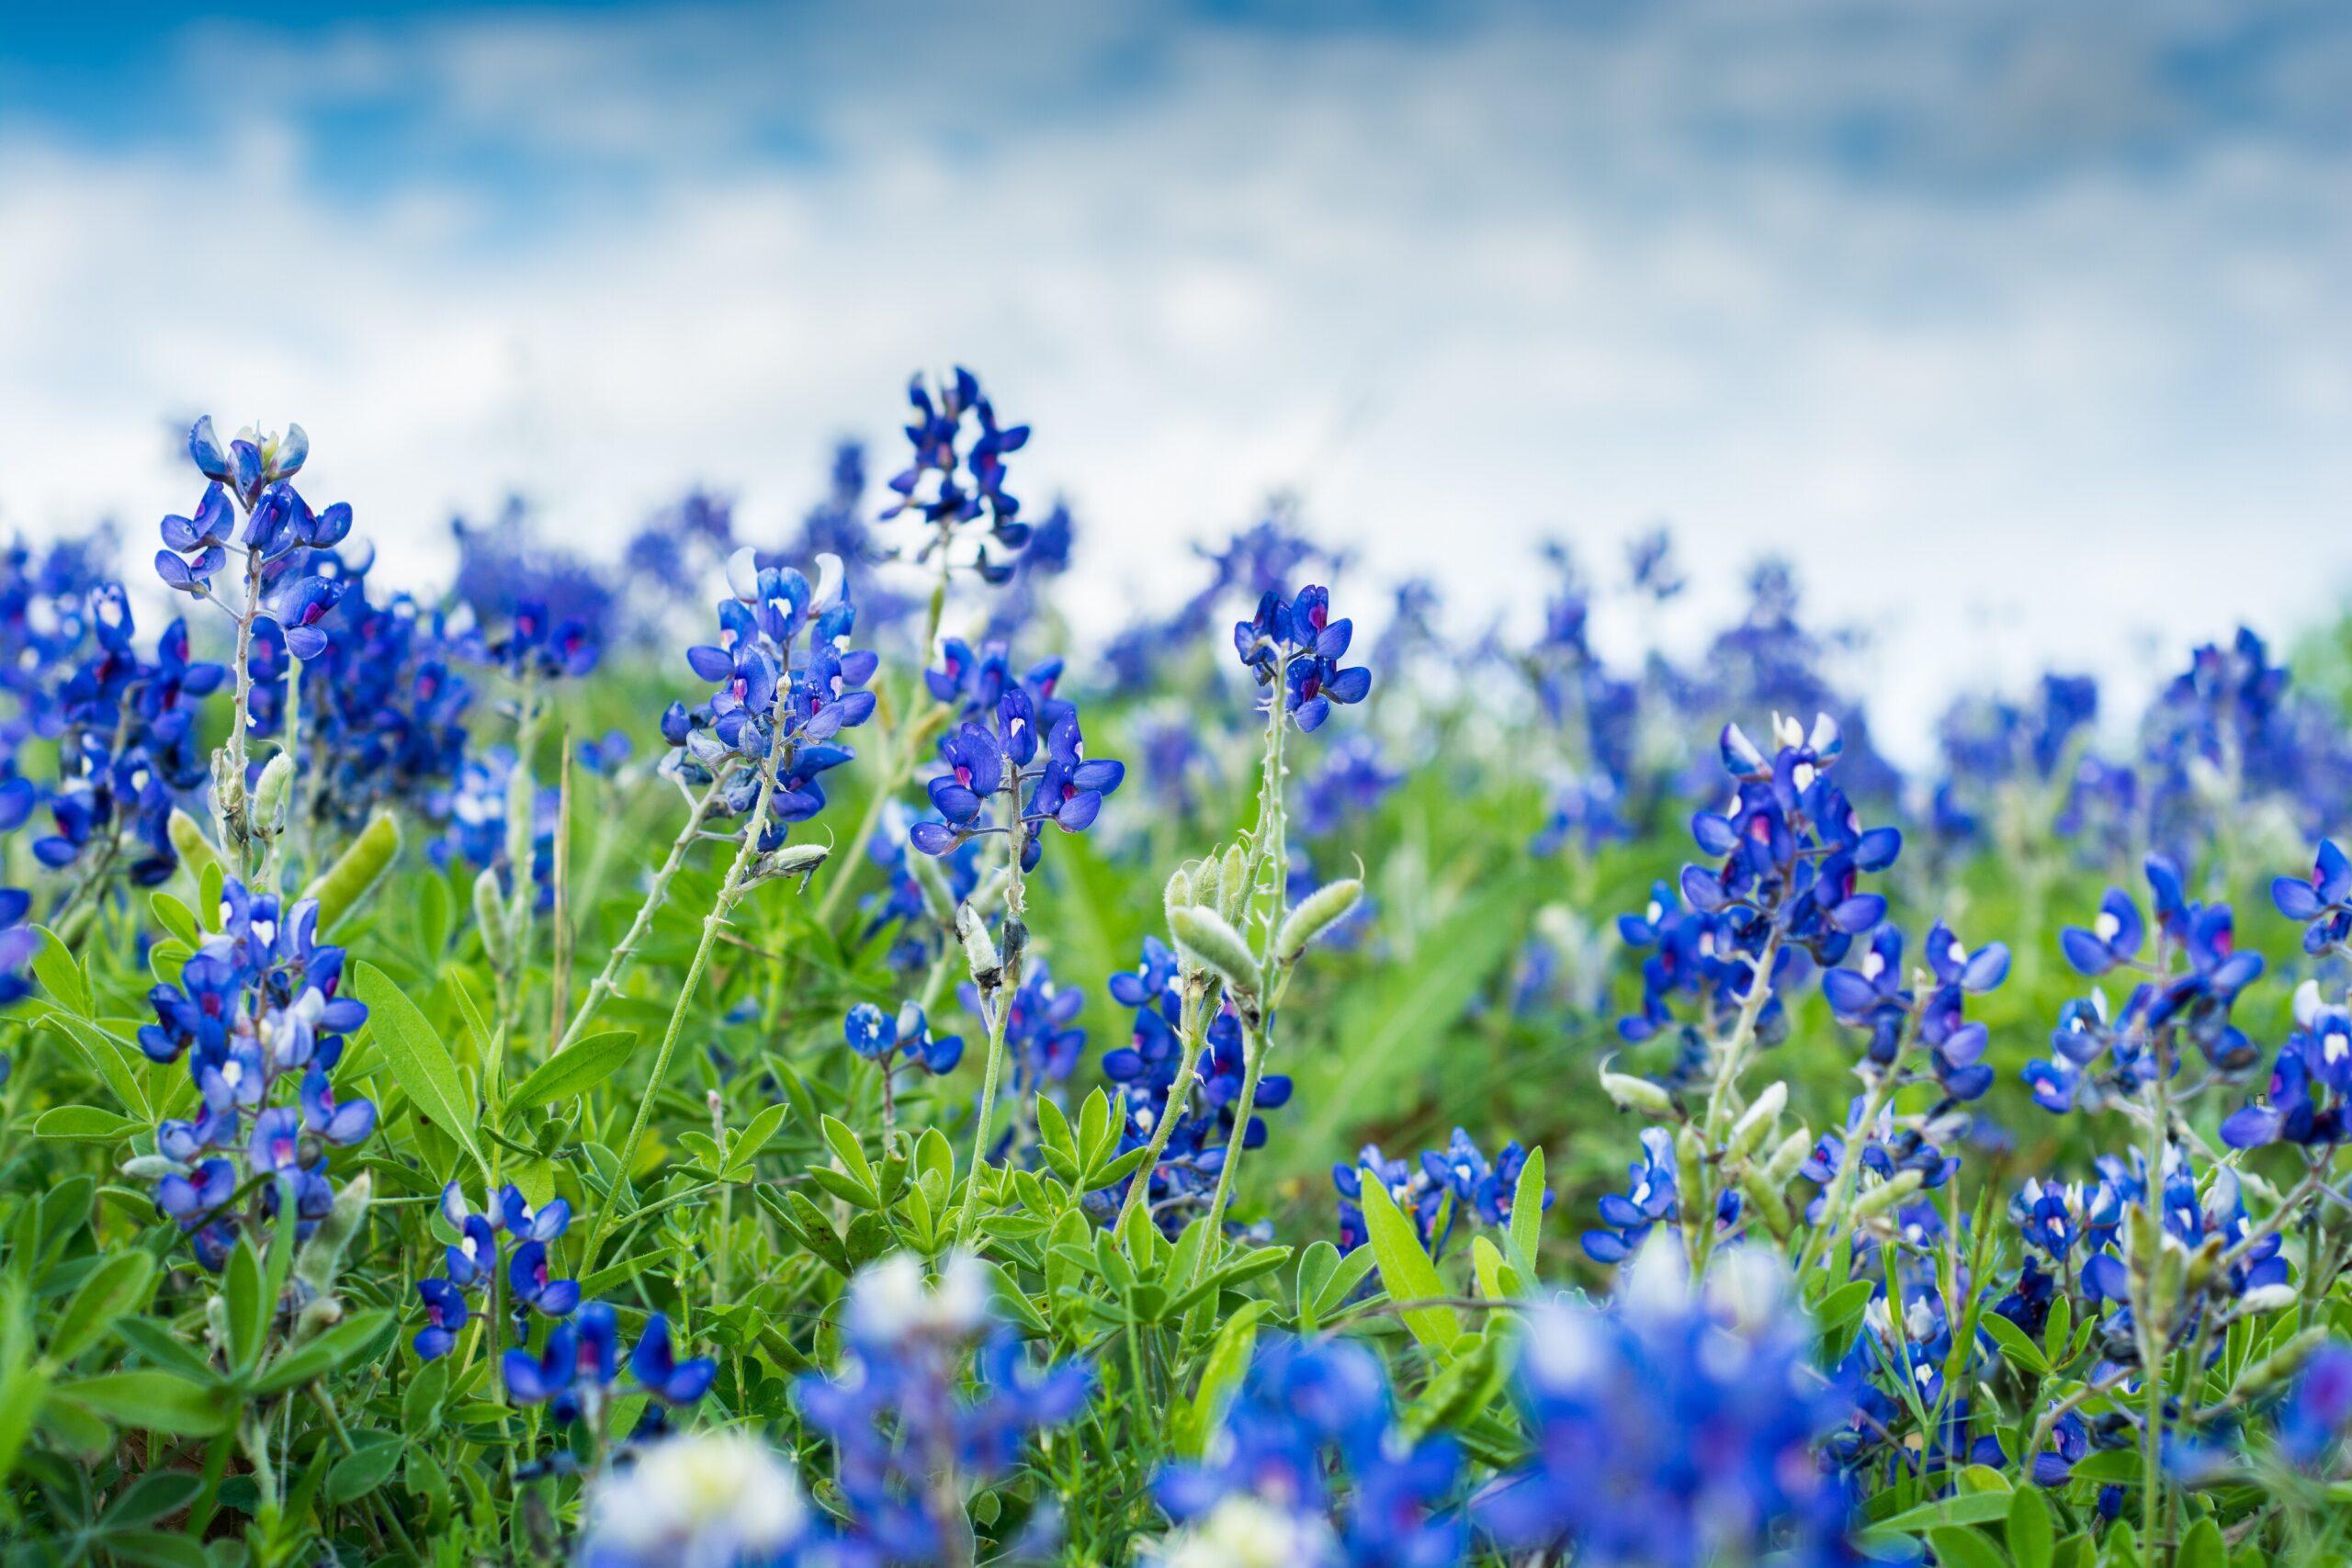 Texas Blue Bonnet Flowers in Addison, Texas